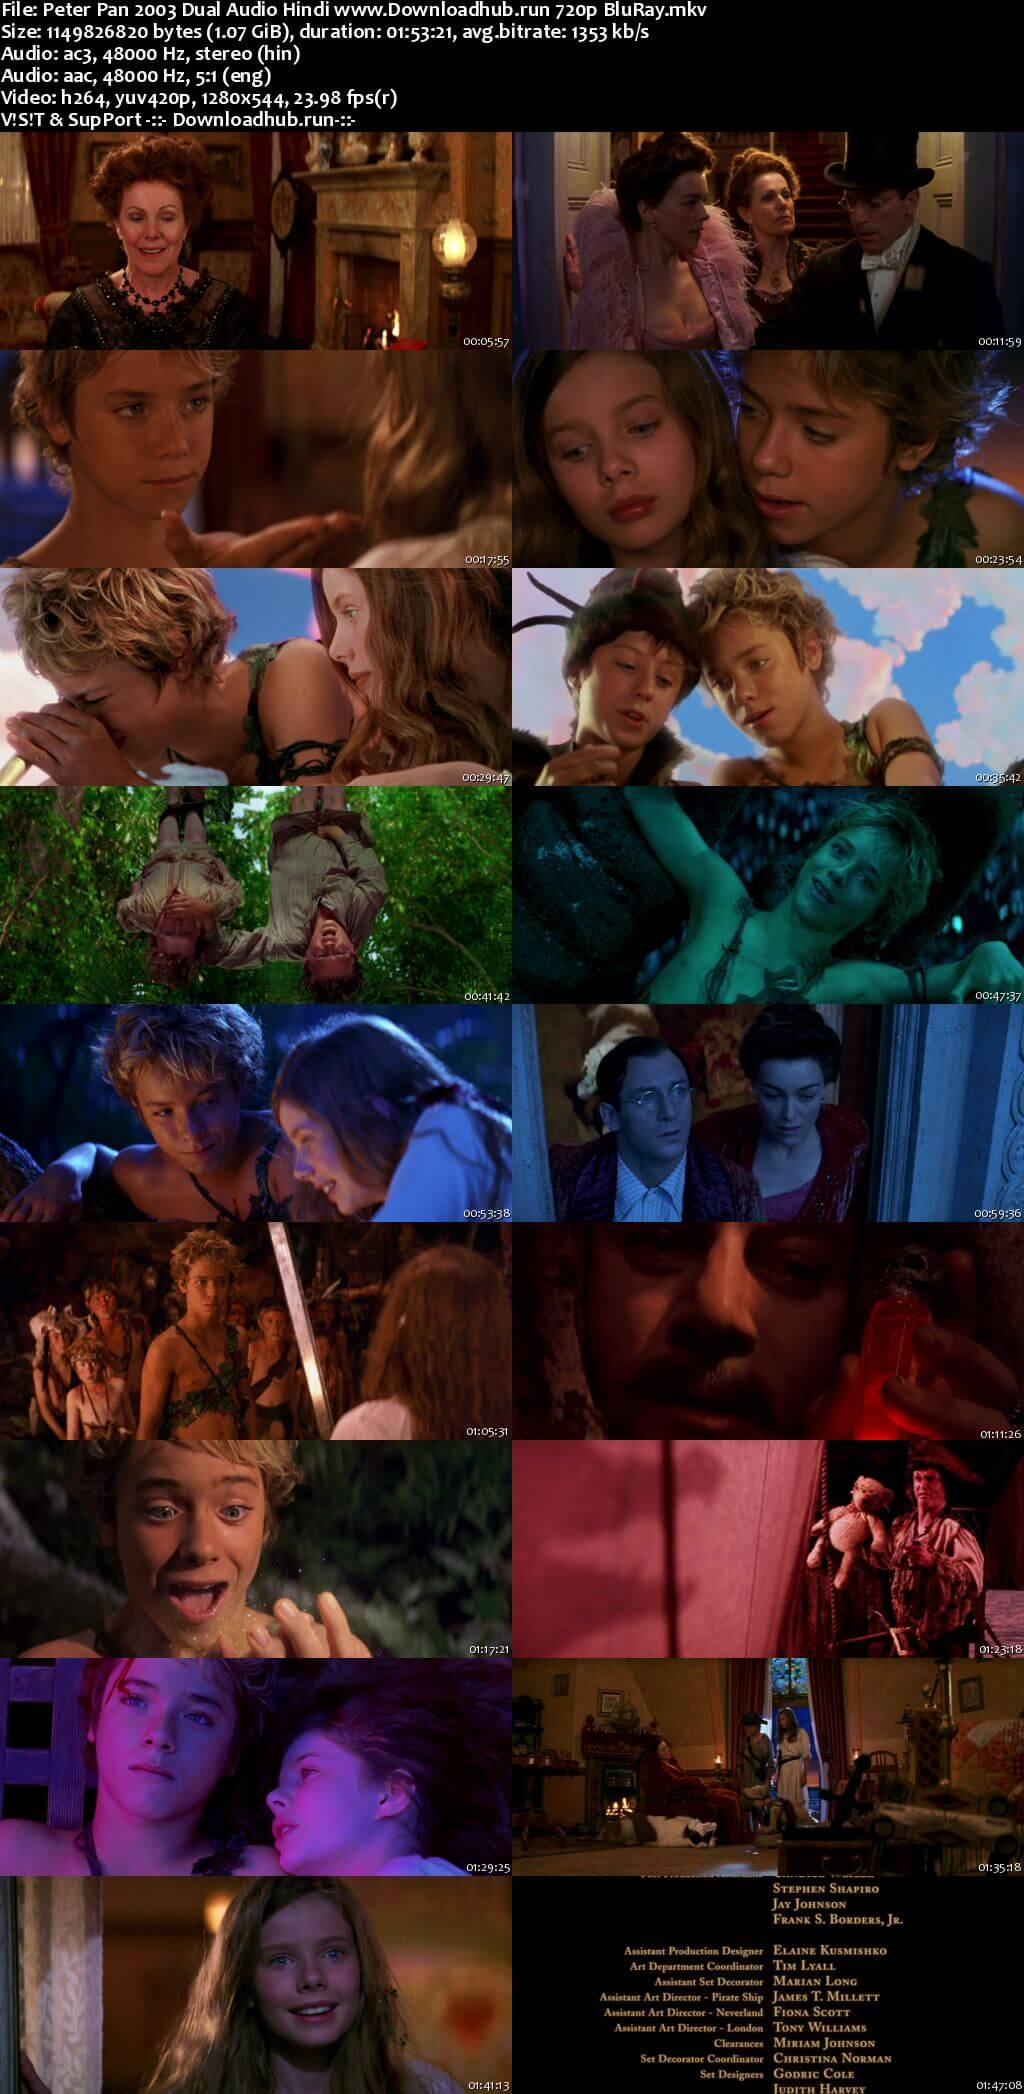 Peter Pan 2003 Hindi Dual Audio 720p BluRay x264